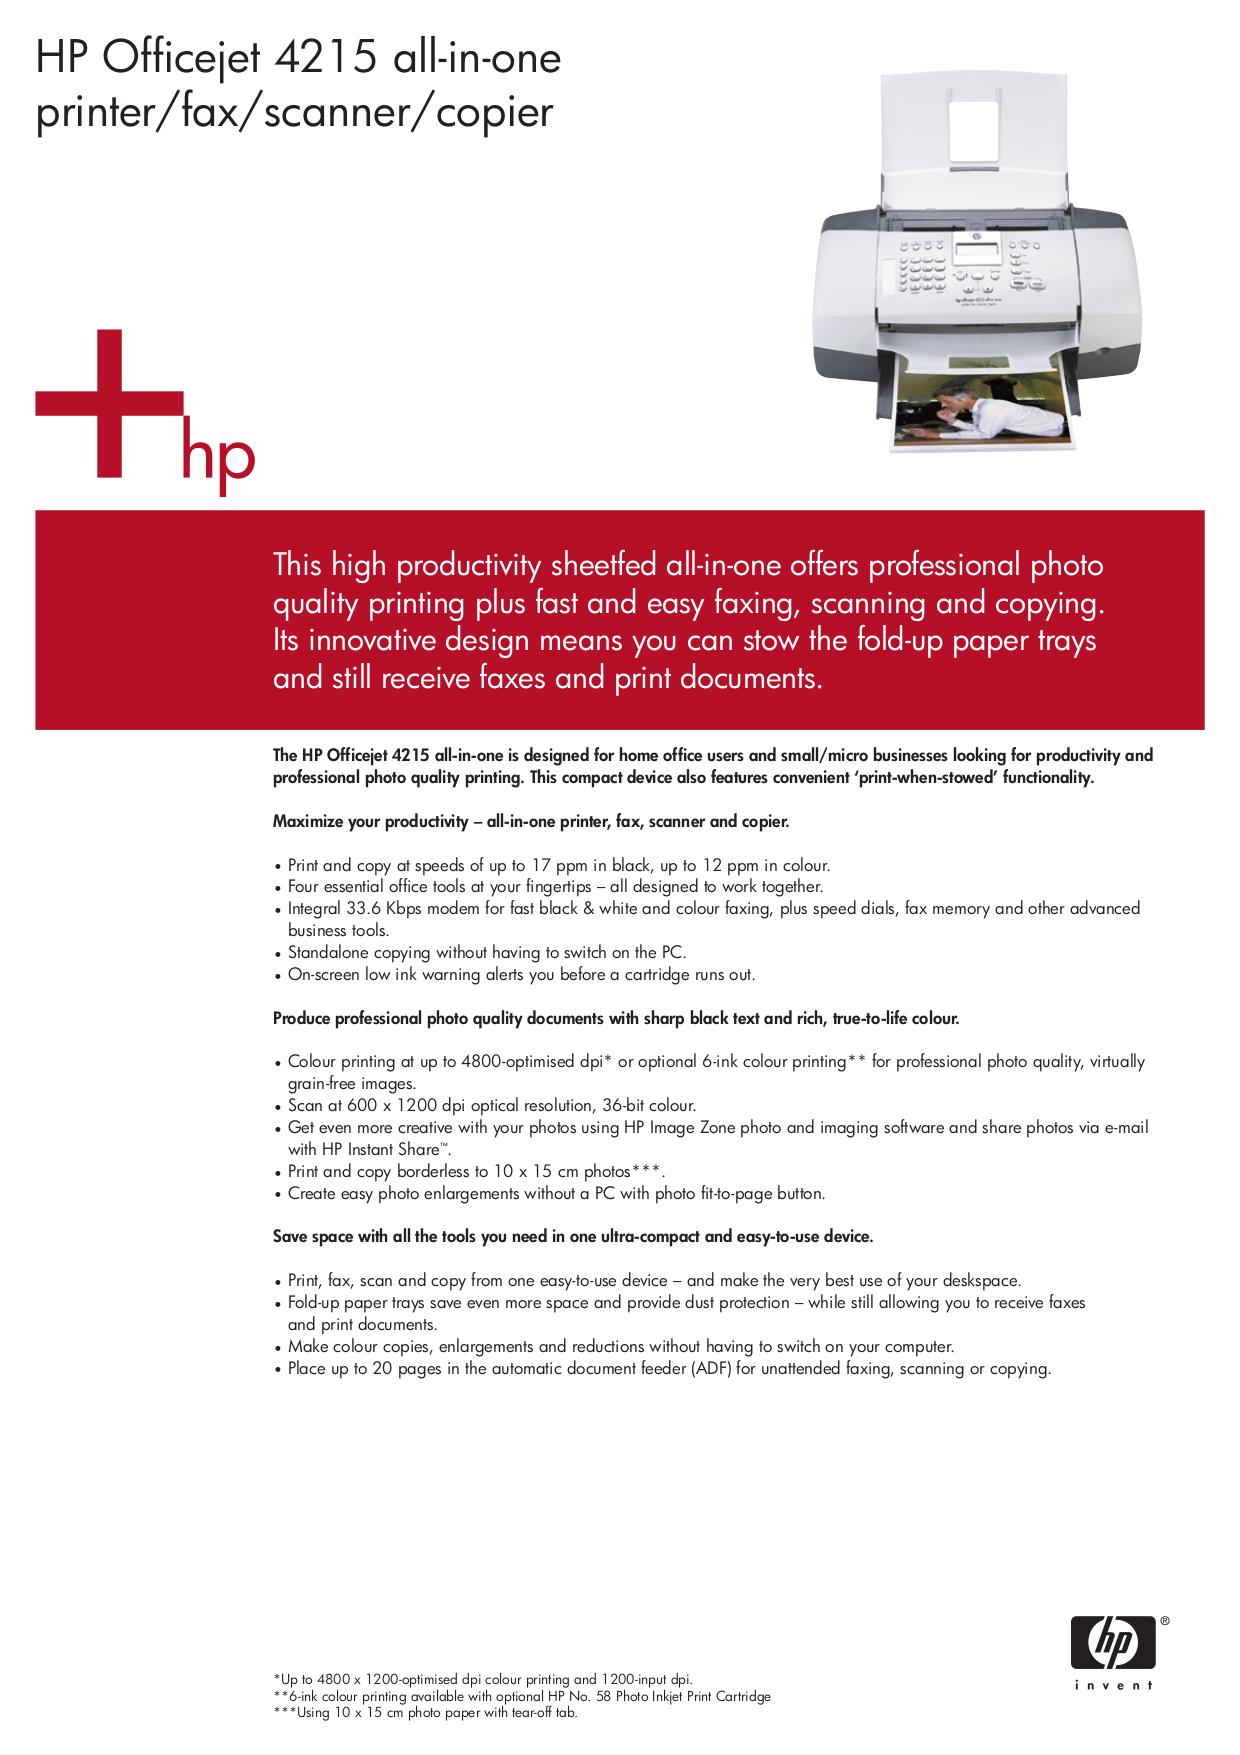 pdf for HP Multifunction Printer Officejet 4215v manual